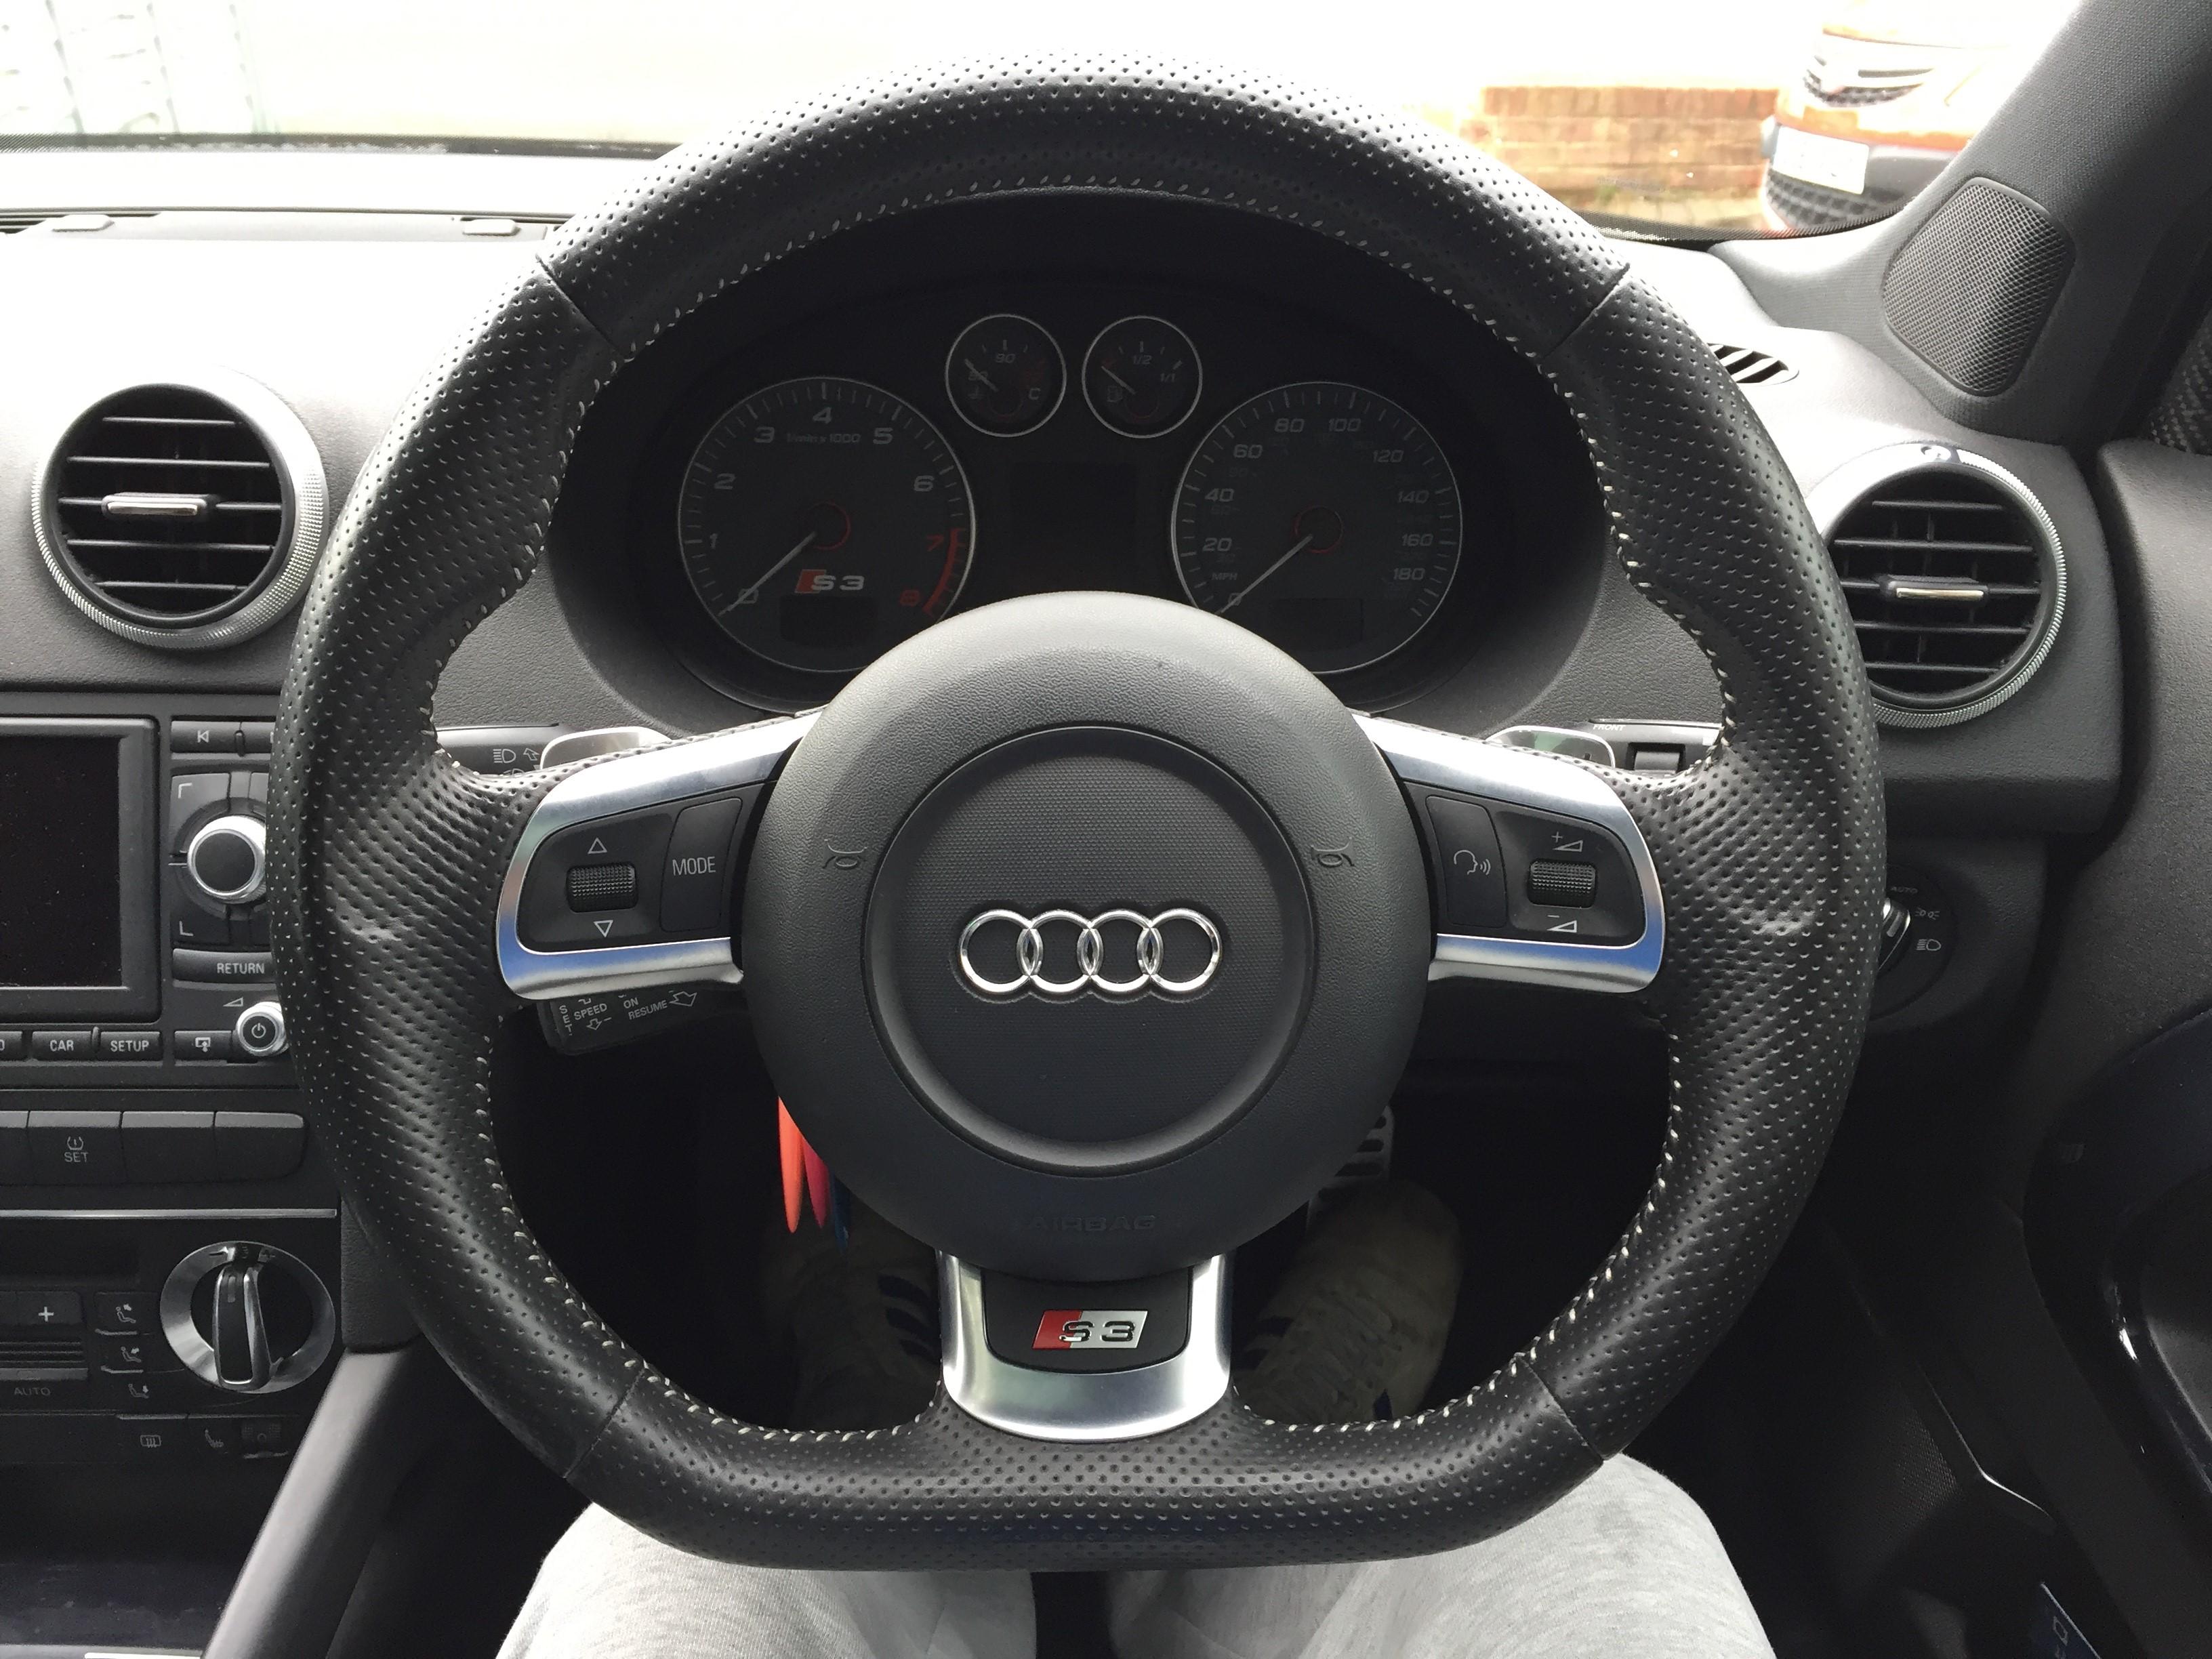 TTRS Steering Wheel.jpg